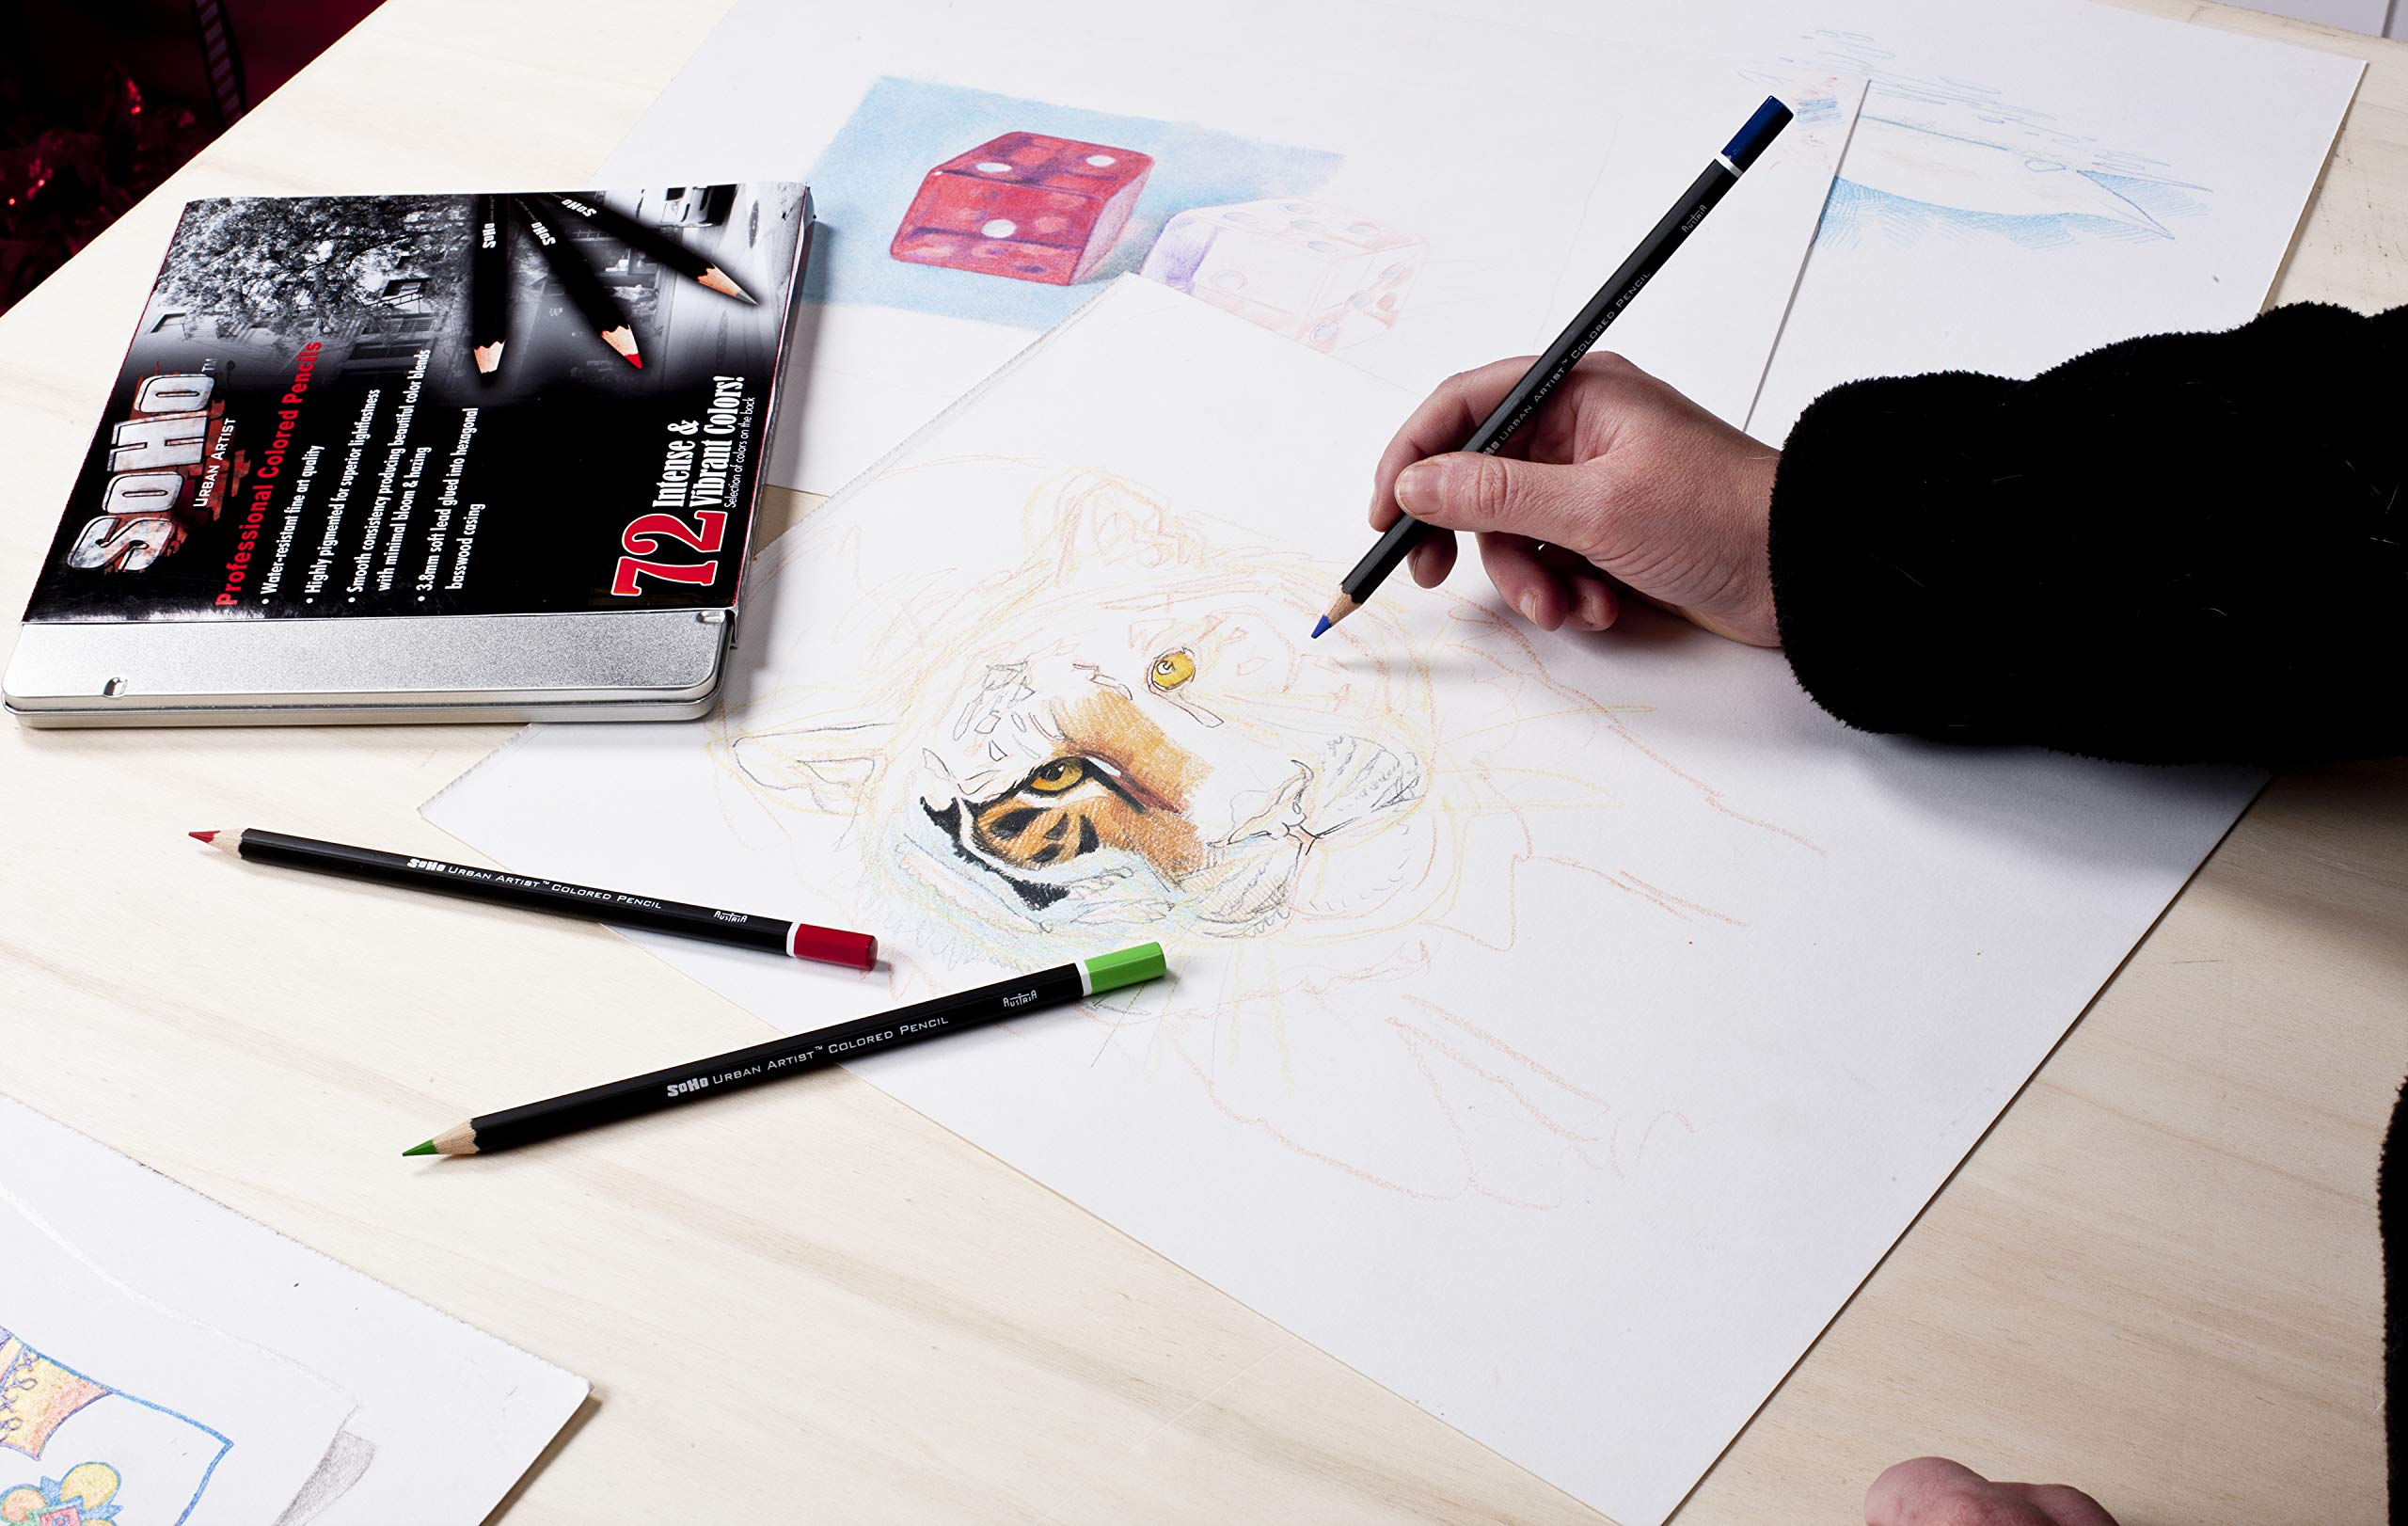 SoHo Urban Artist Professional Colored Pencil Set of 72 - Assorted Colors by Soho Urban Artist (Image #6)